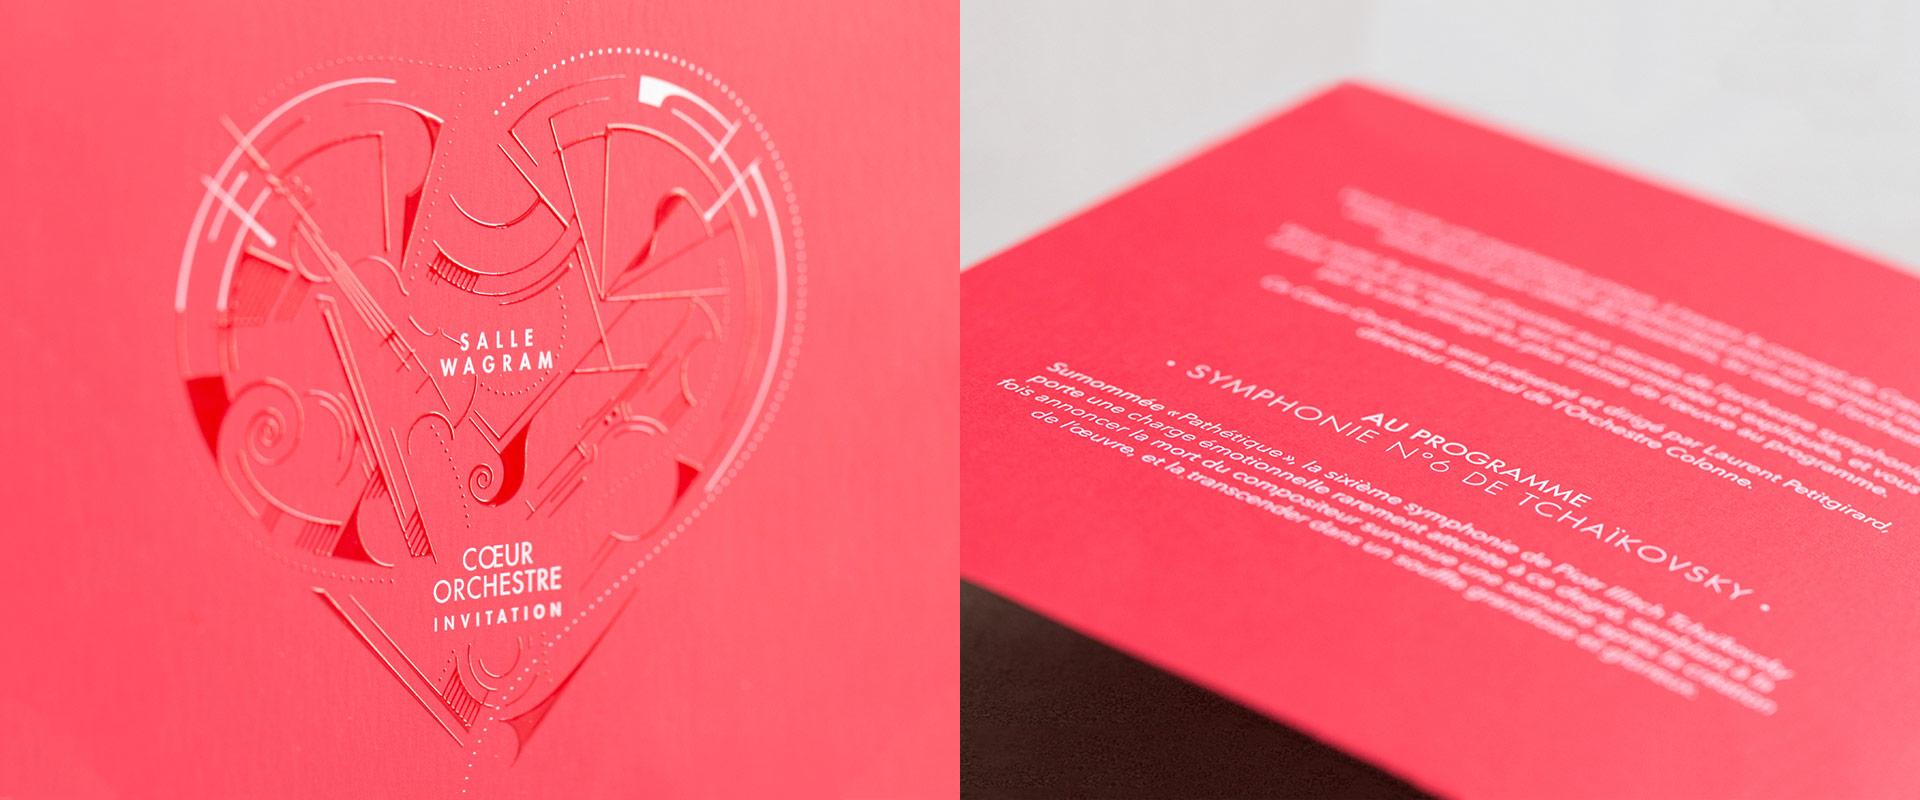 Coeur orchestre invitation vernis relief serigraphie epok design